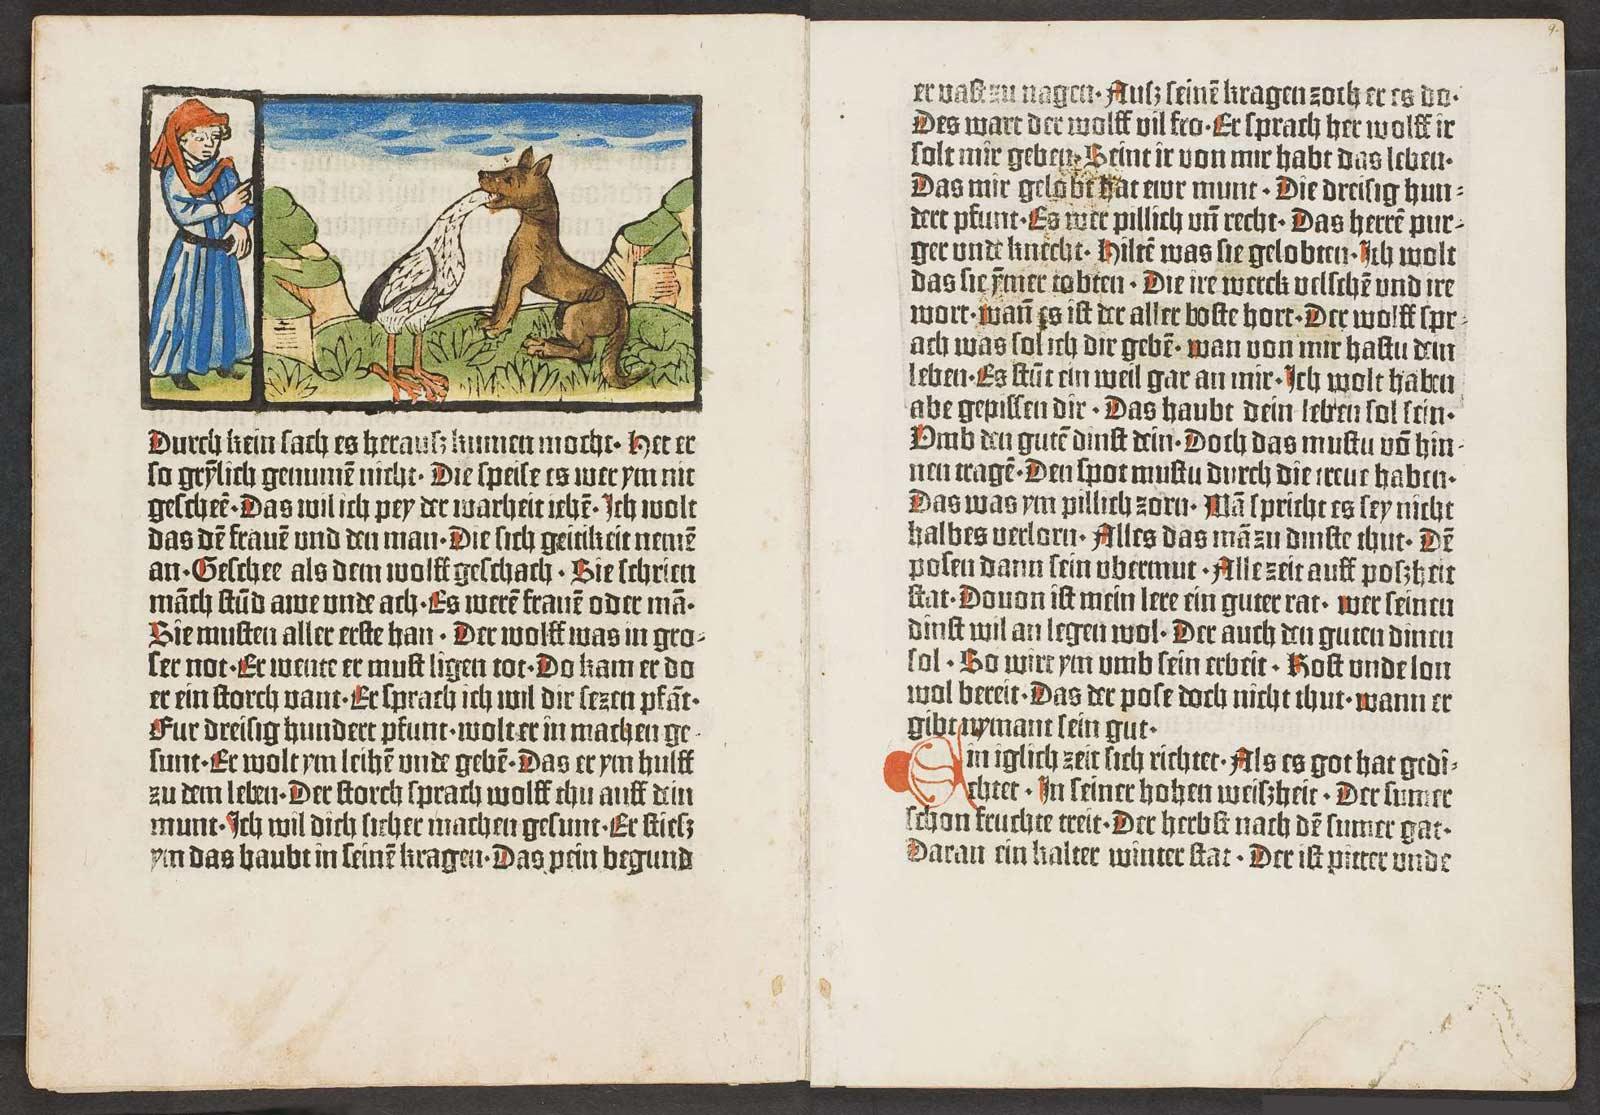 pfister-1461